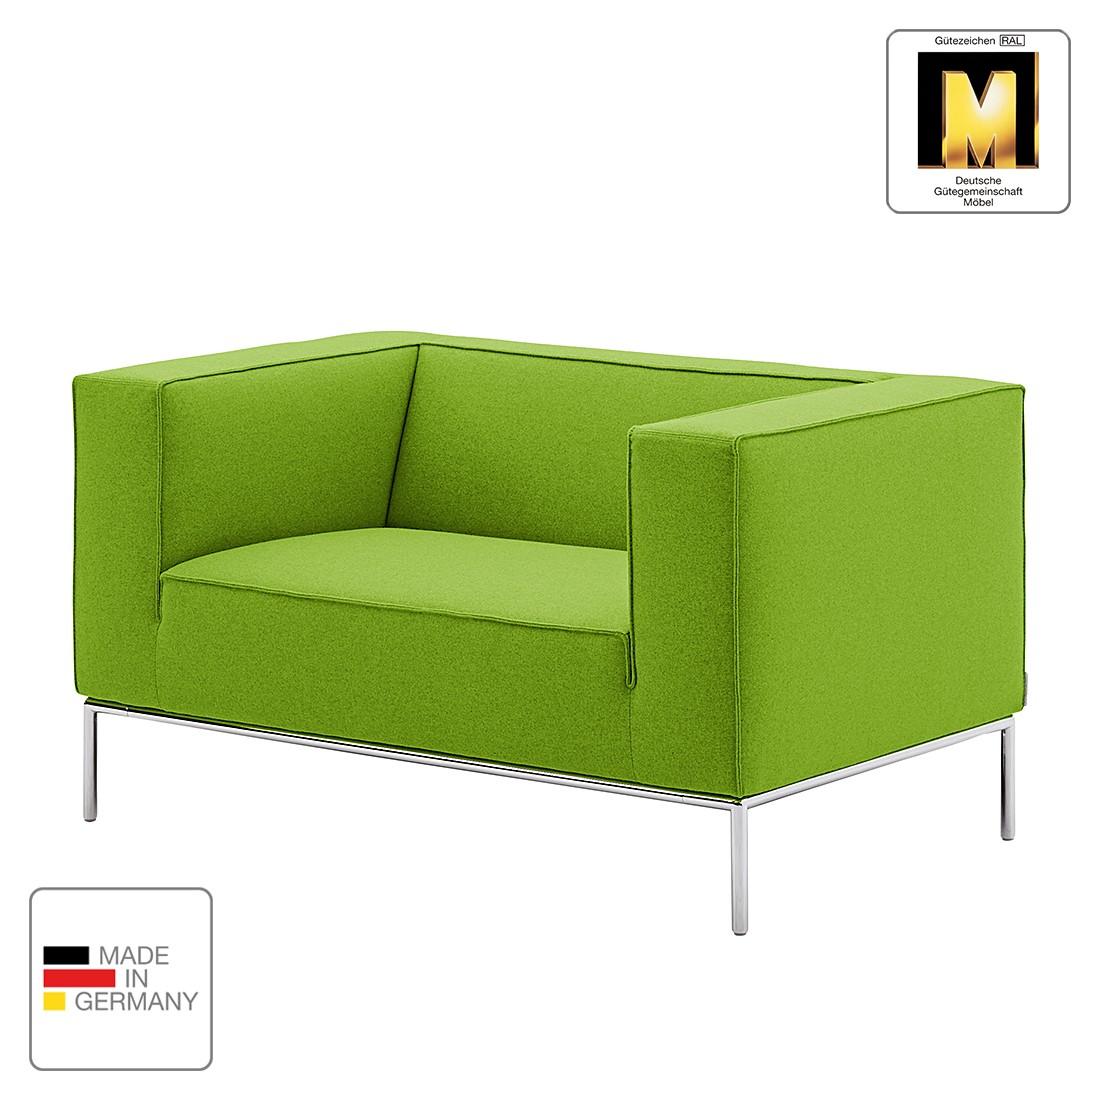 sessel greg webstoff gr n 1 kissen machalke polsterwerkst tten g nstig online kaufen. Black Bedroom Furniture Sets. Home Design Ideas